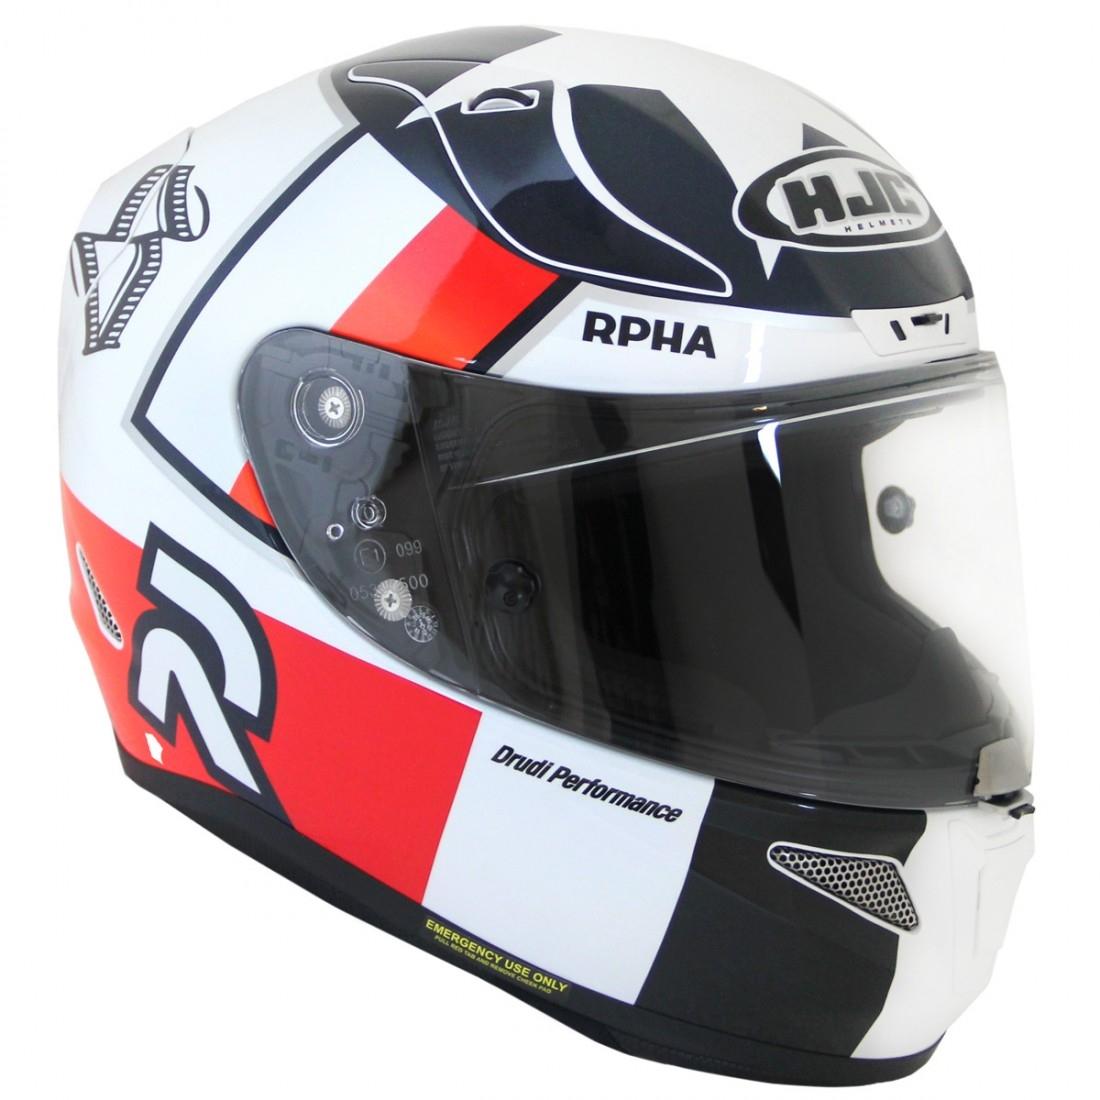 Hjc Rpha 11 >> Hjc Rpha 11 Ben Spies Mc 1 Helmet Motocard